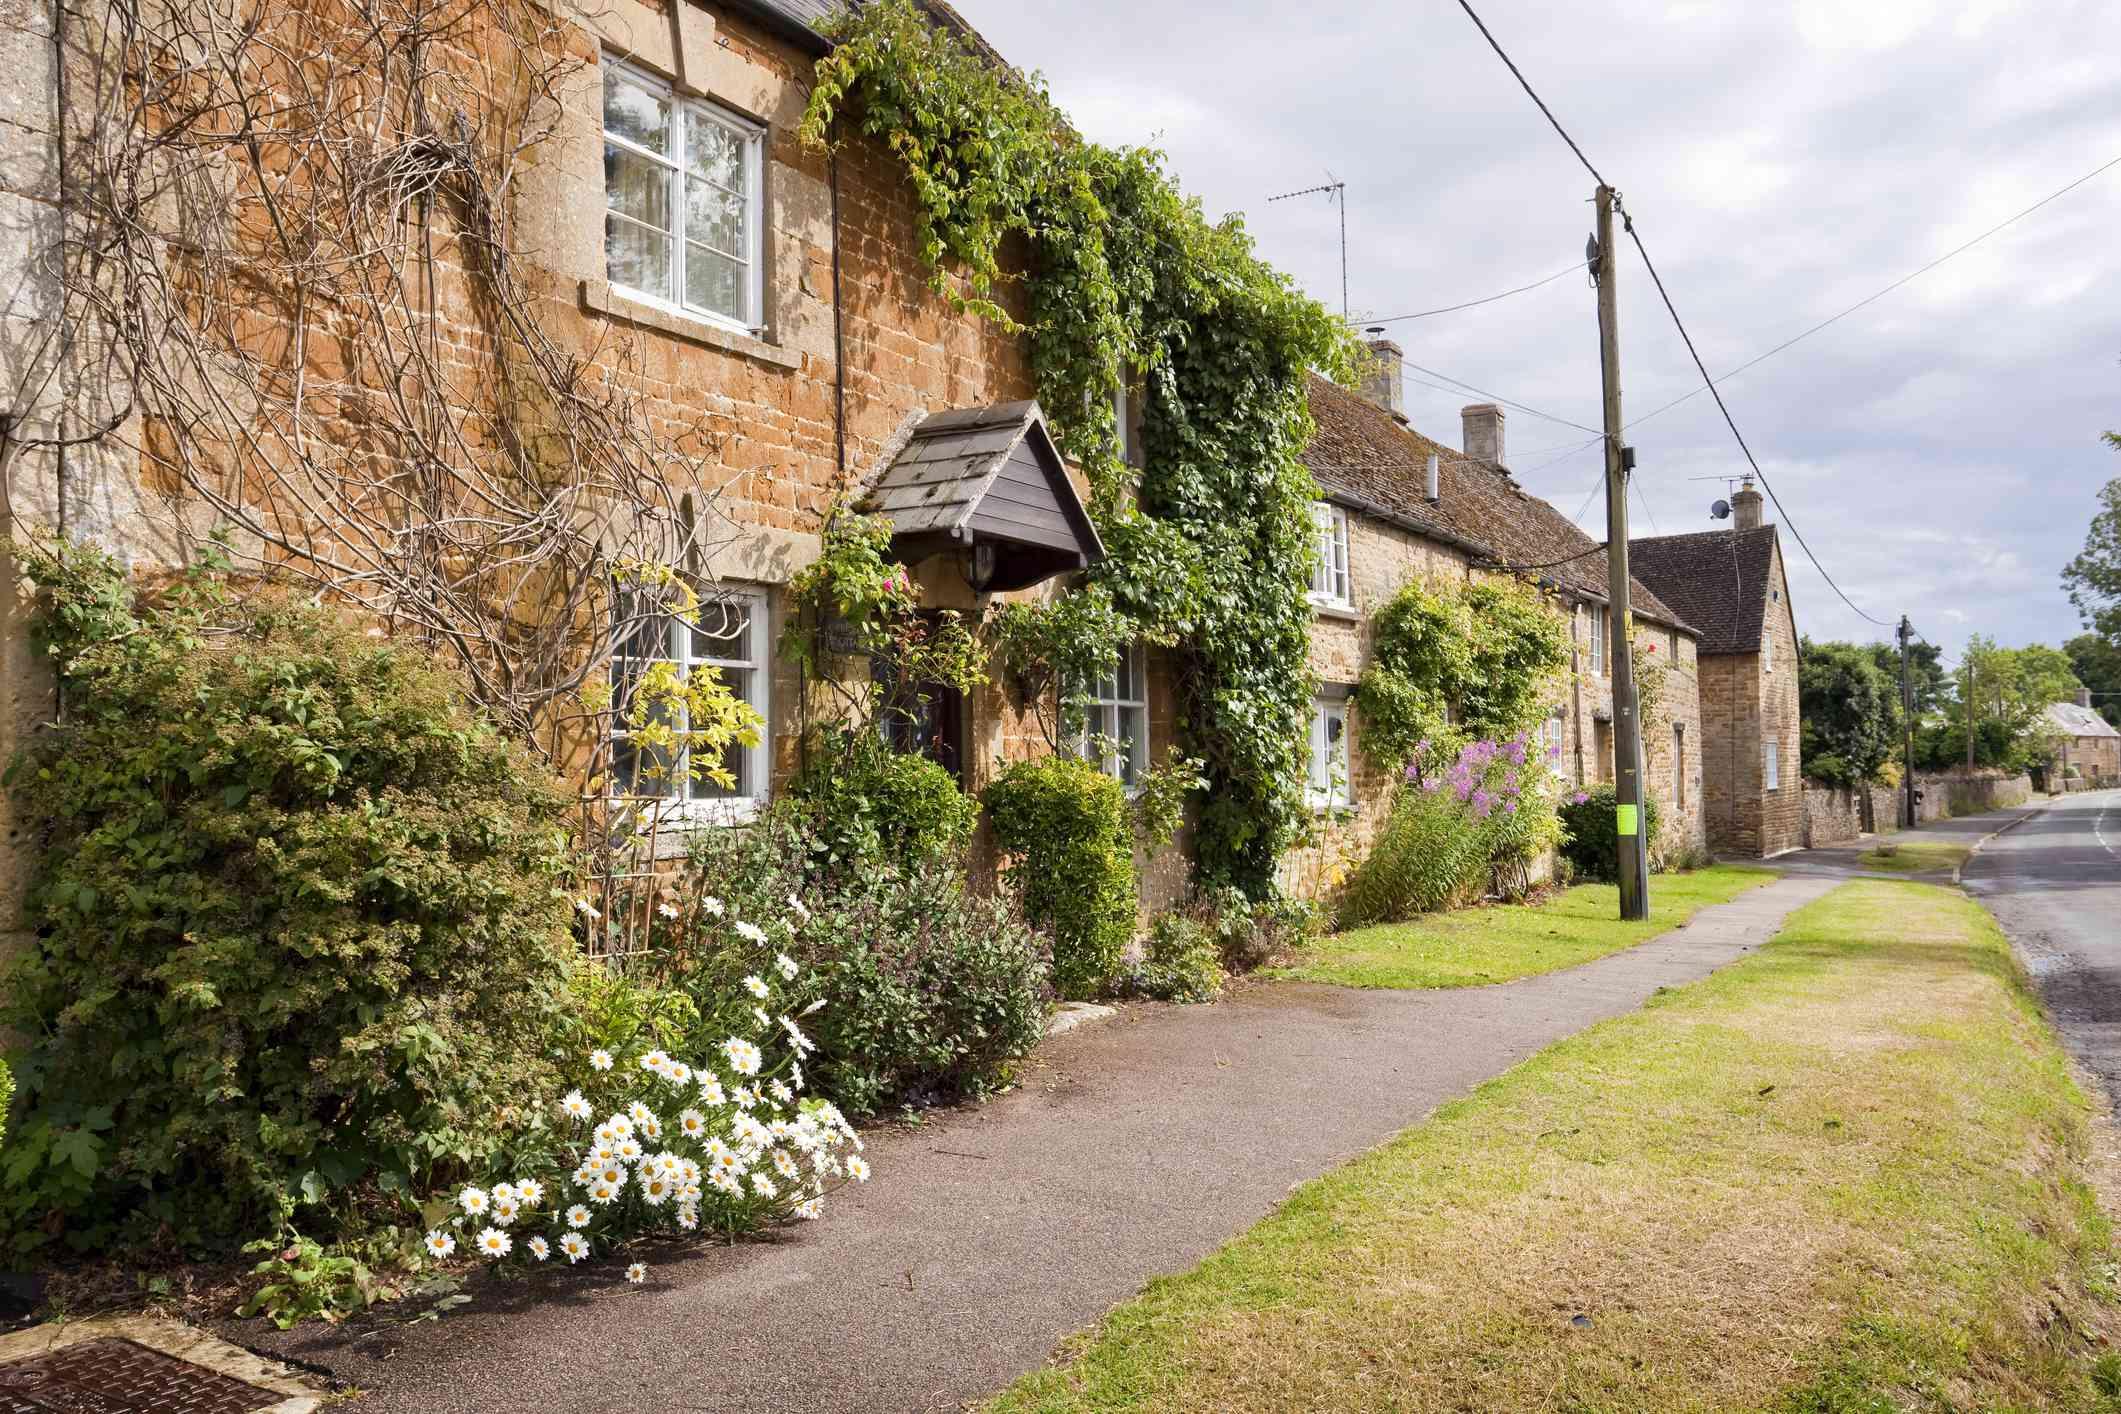 Kingham terraced cottages